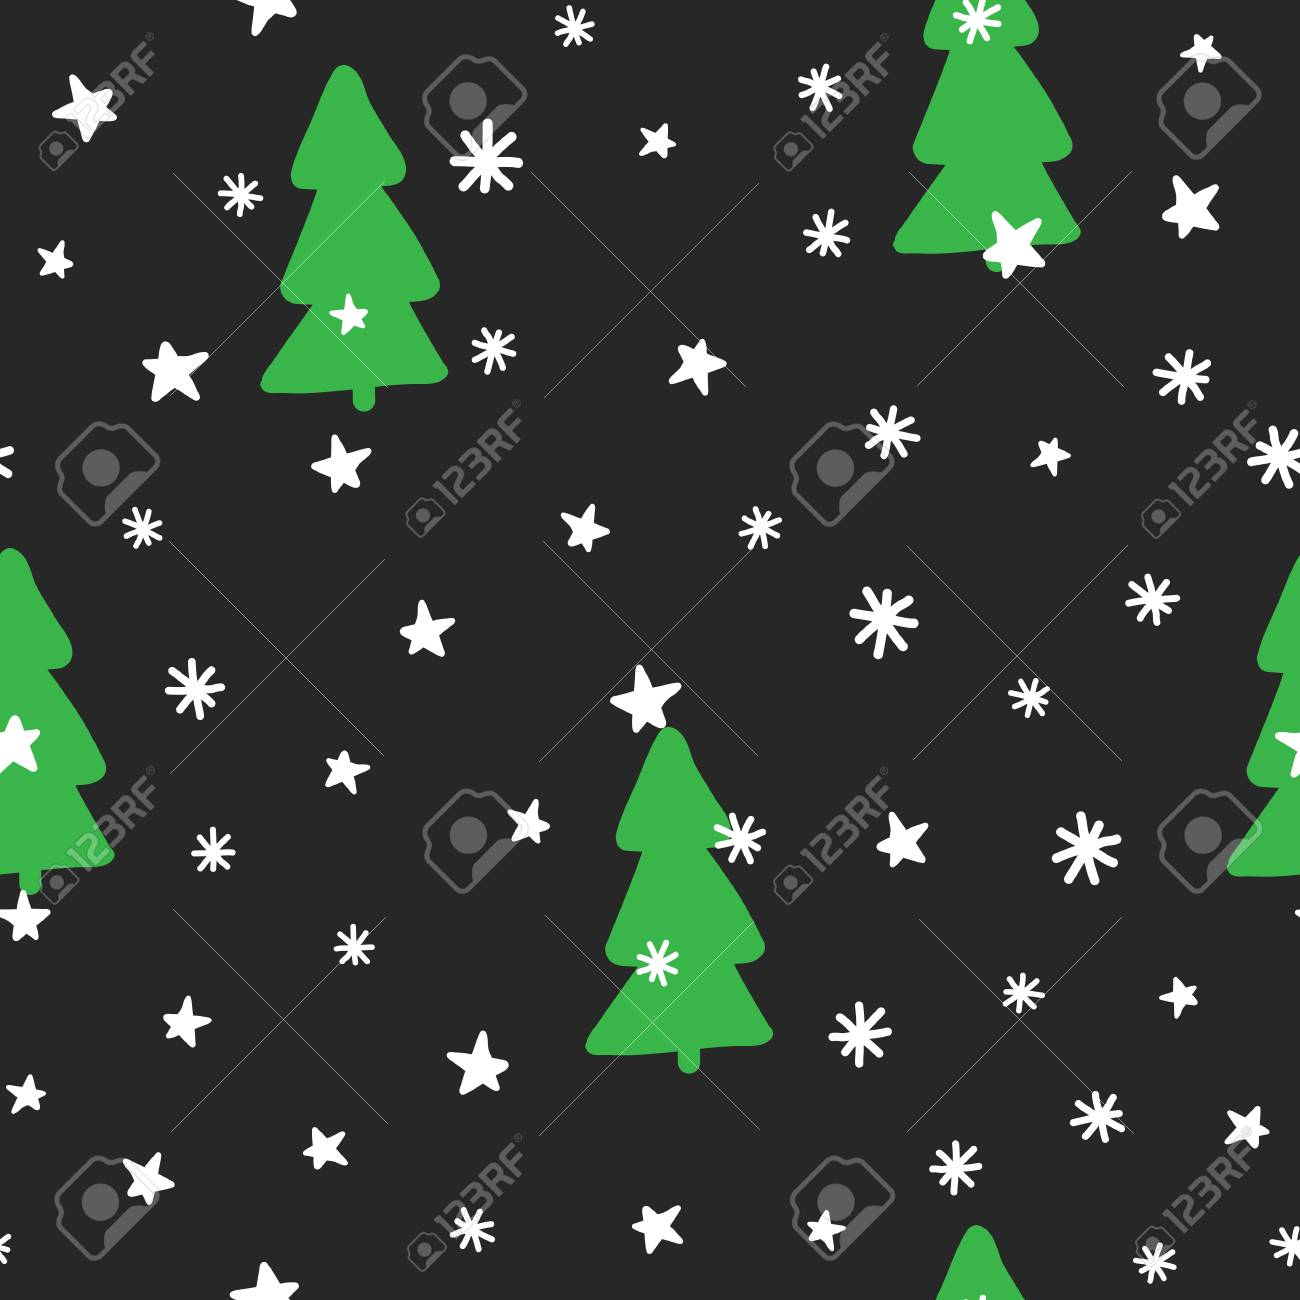 New Year Seamless Pattern Christmas Trees Snowflakes Stars